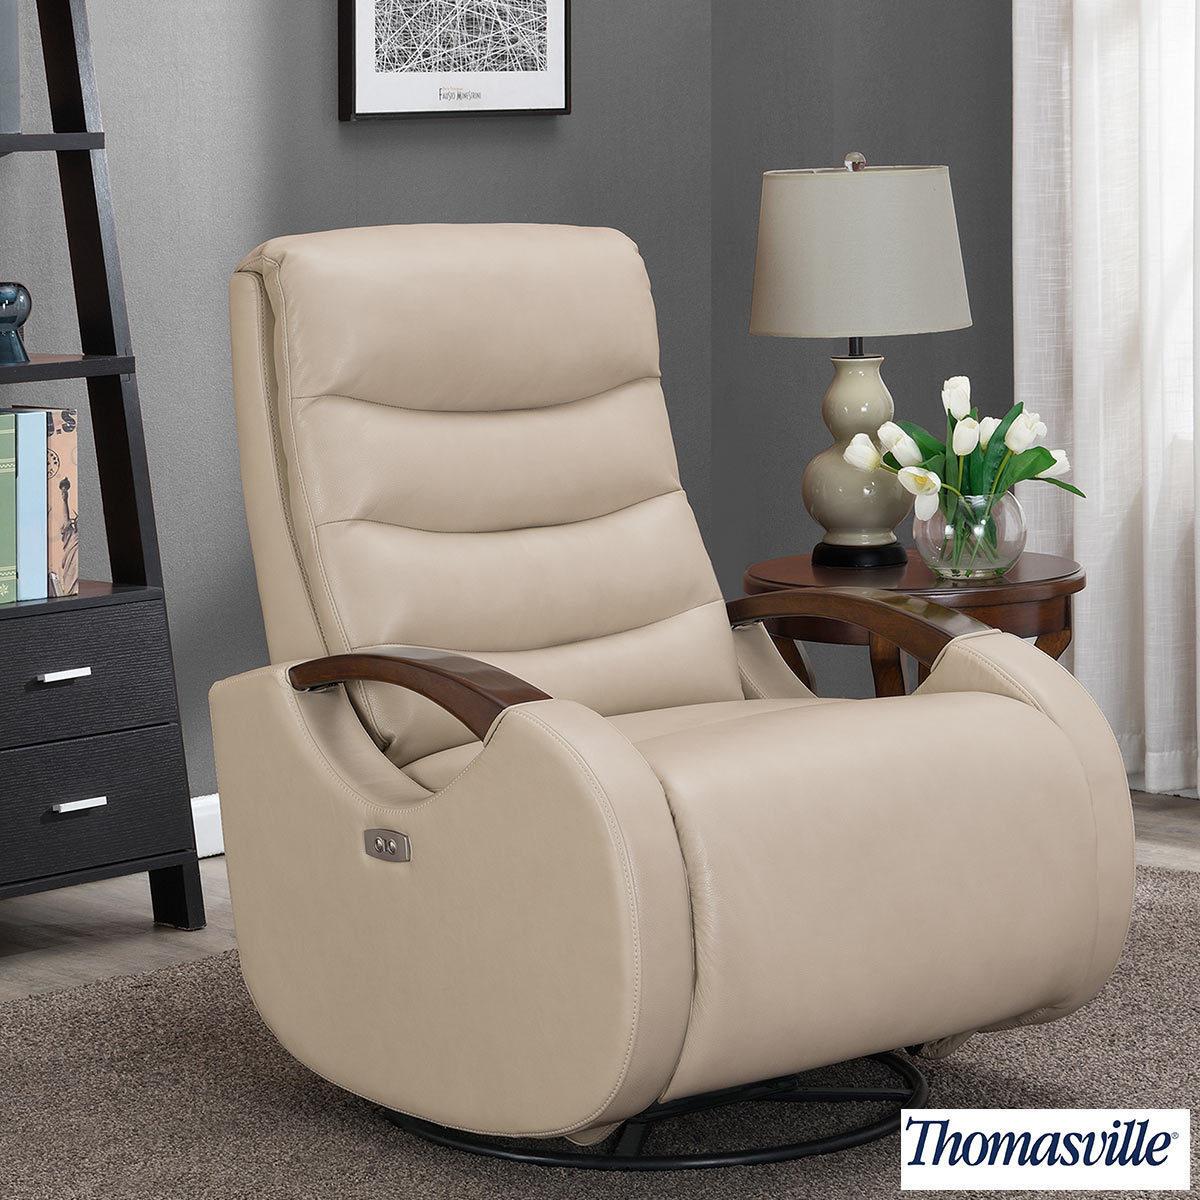 thomasville benson leather power glider recliner chair costco uk